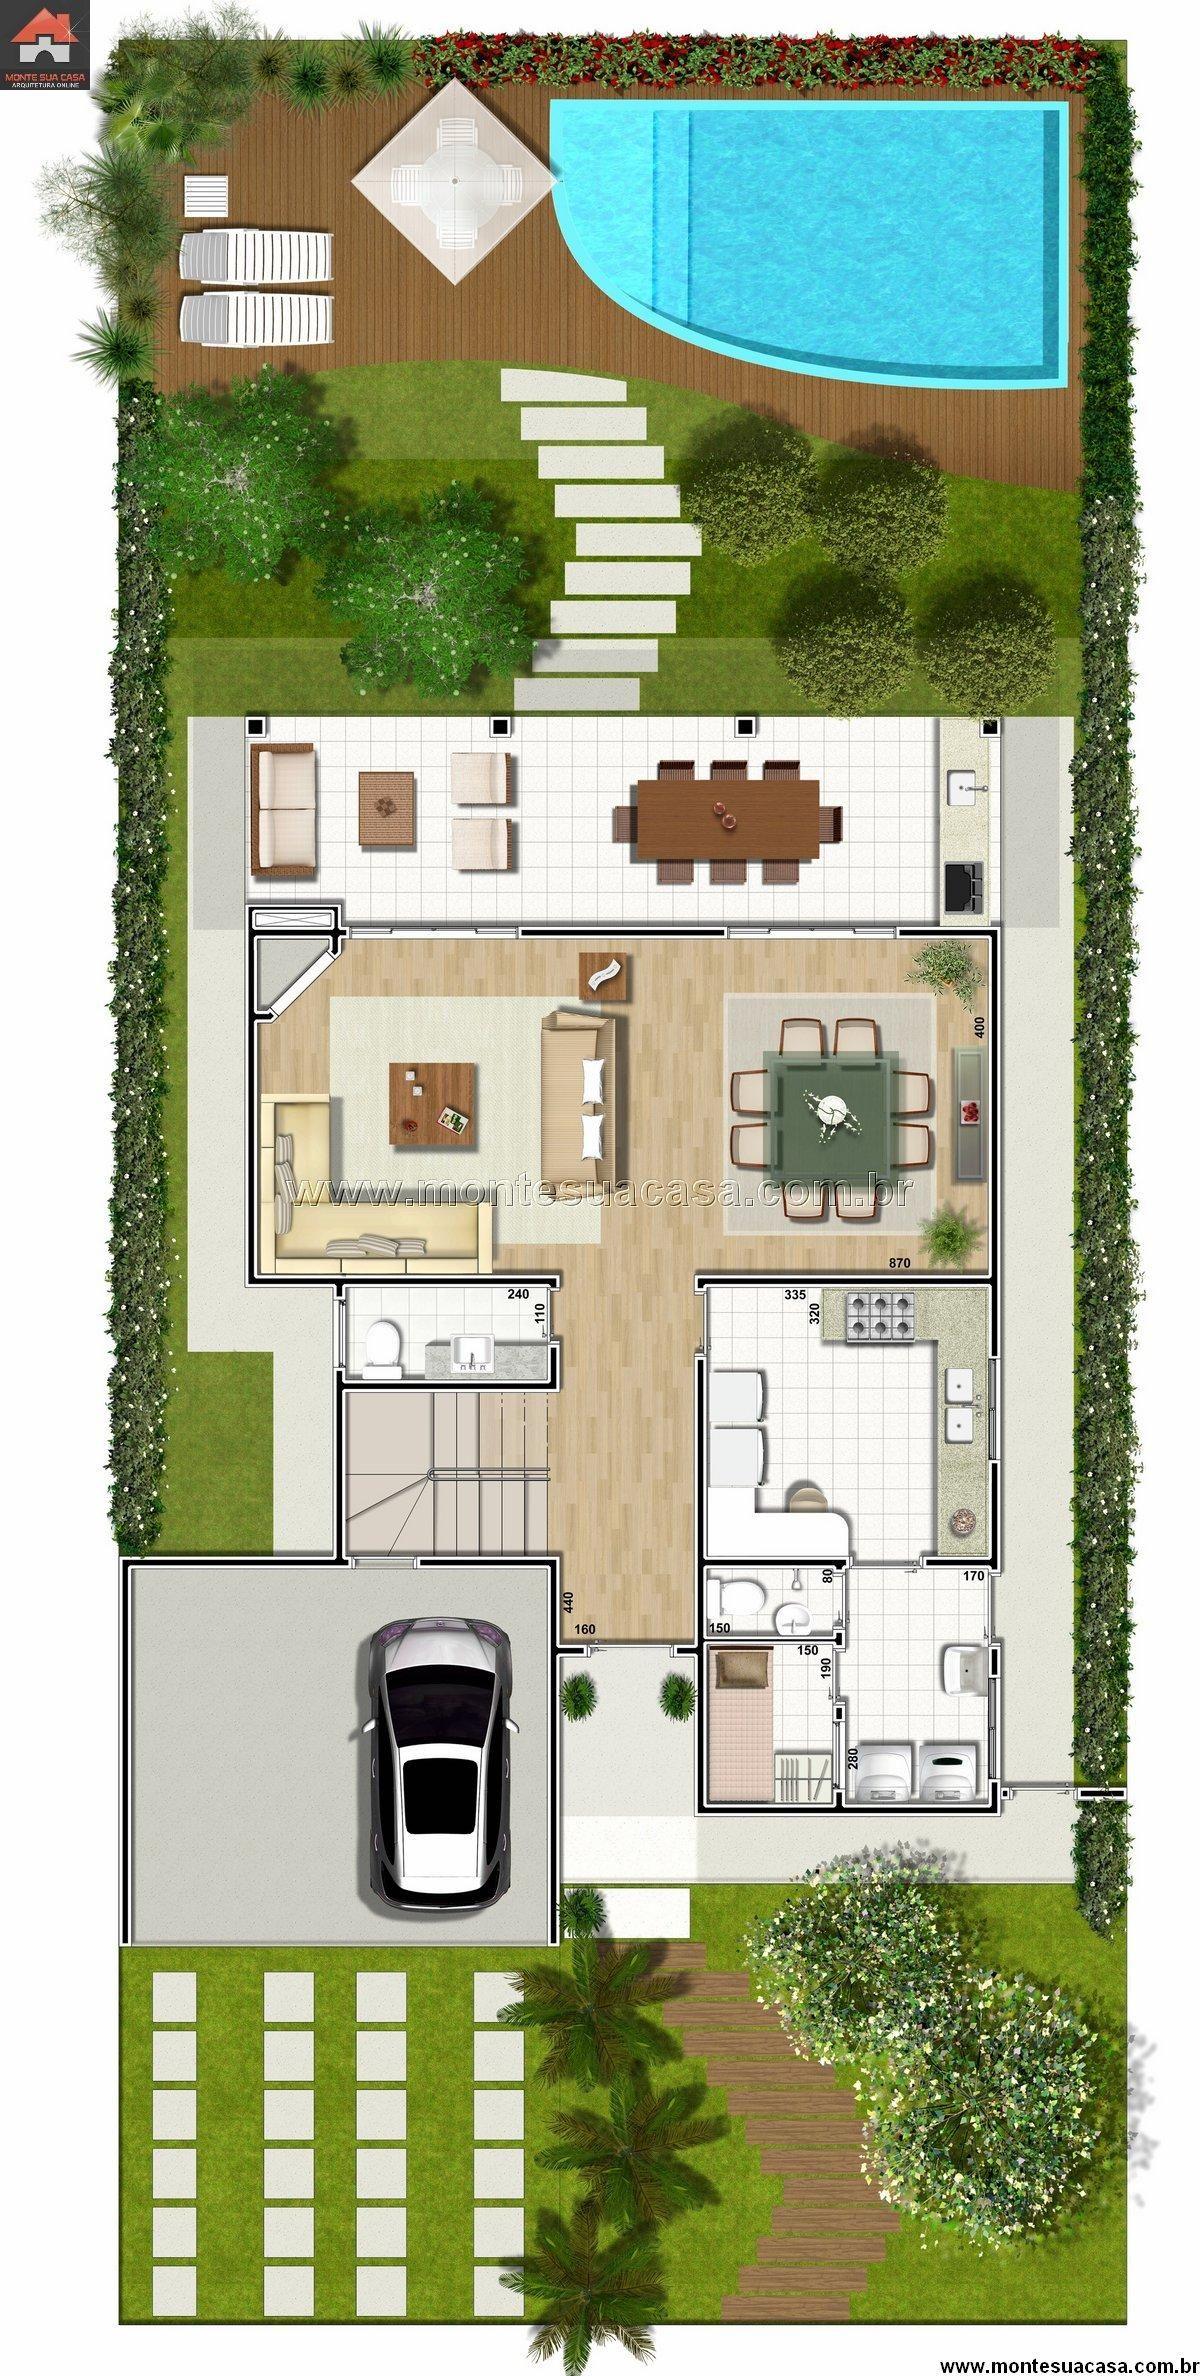 Sobrado 2 quartos casas pinterest plantas for Plantas de casas modernas con piscina